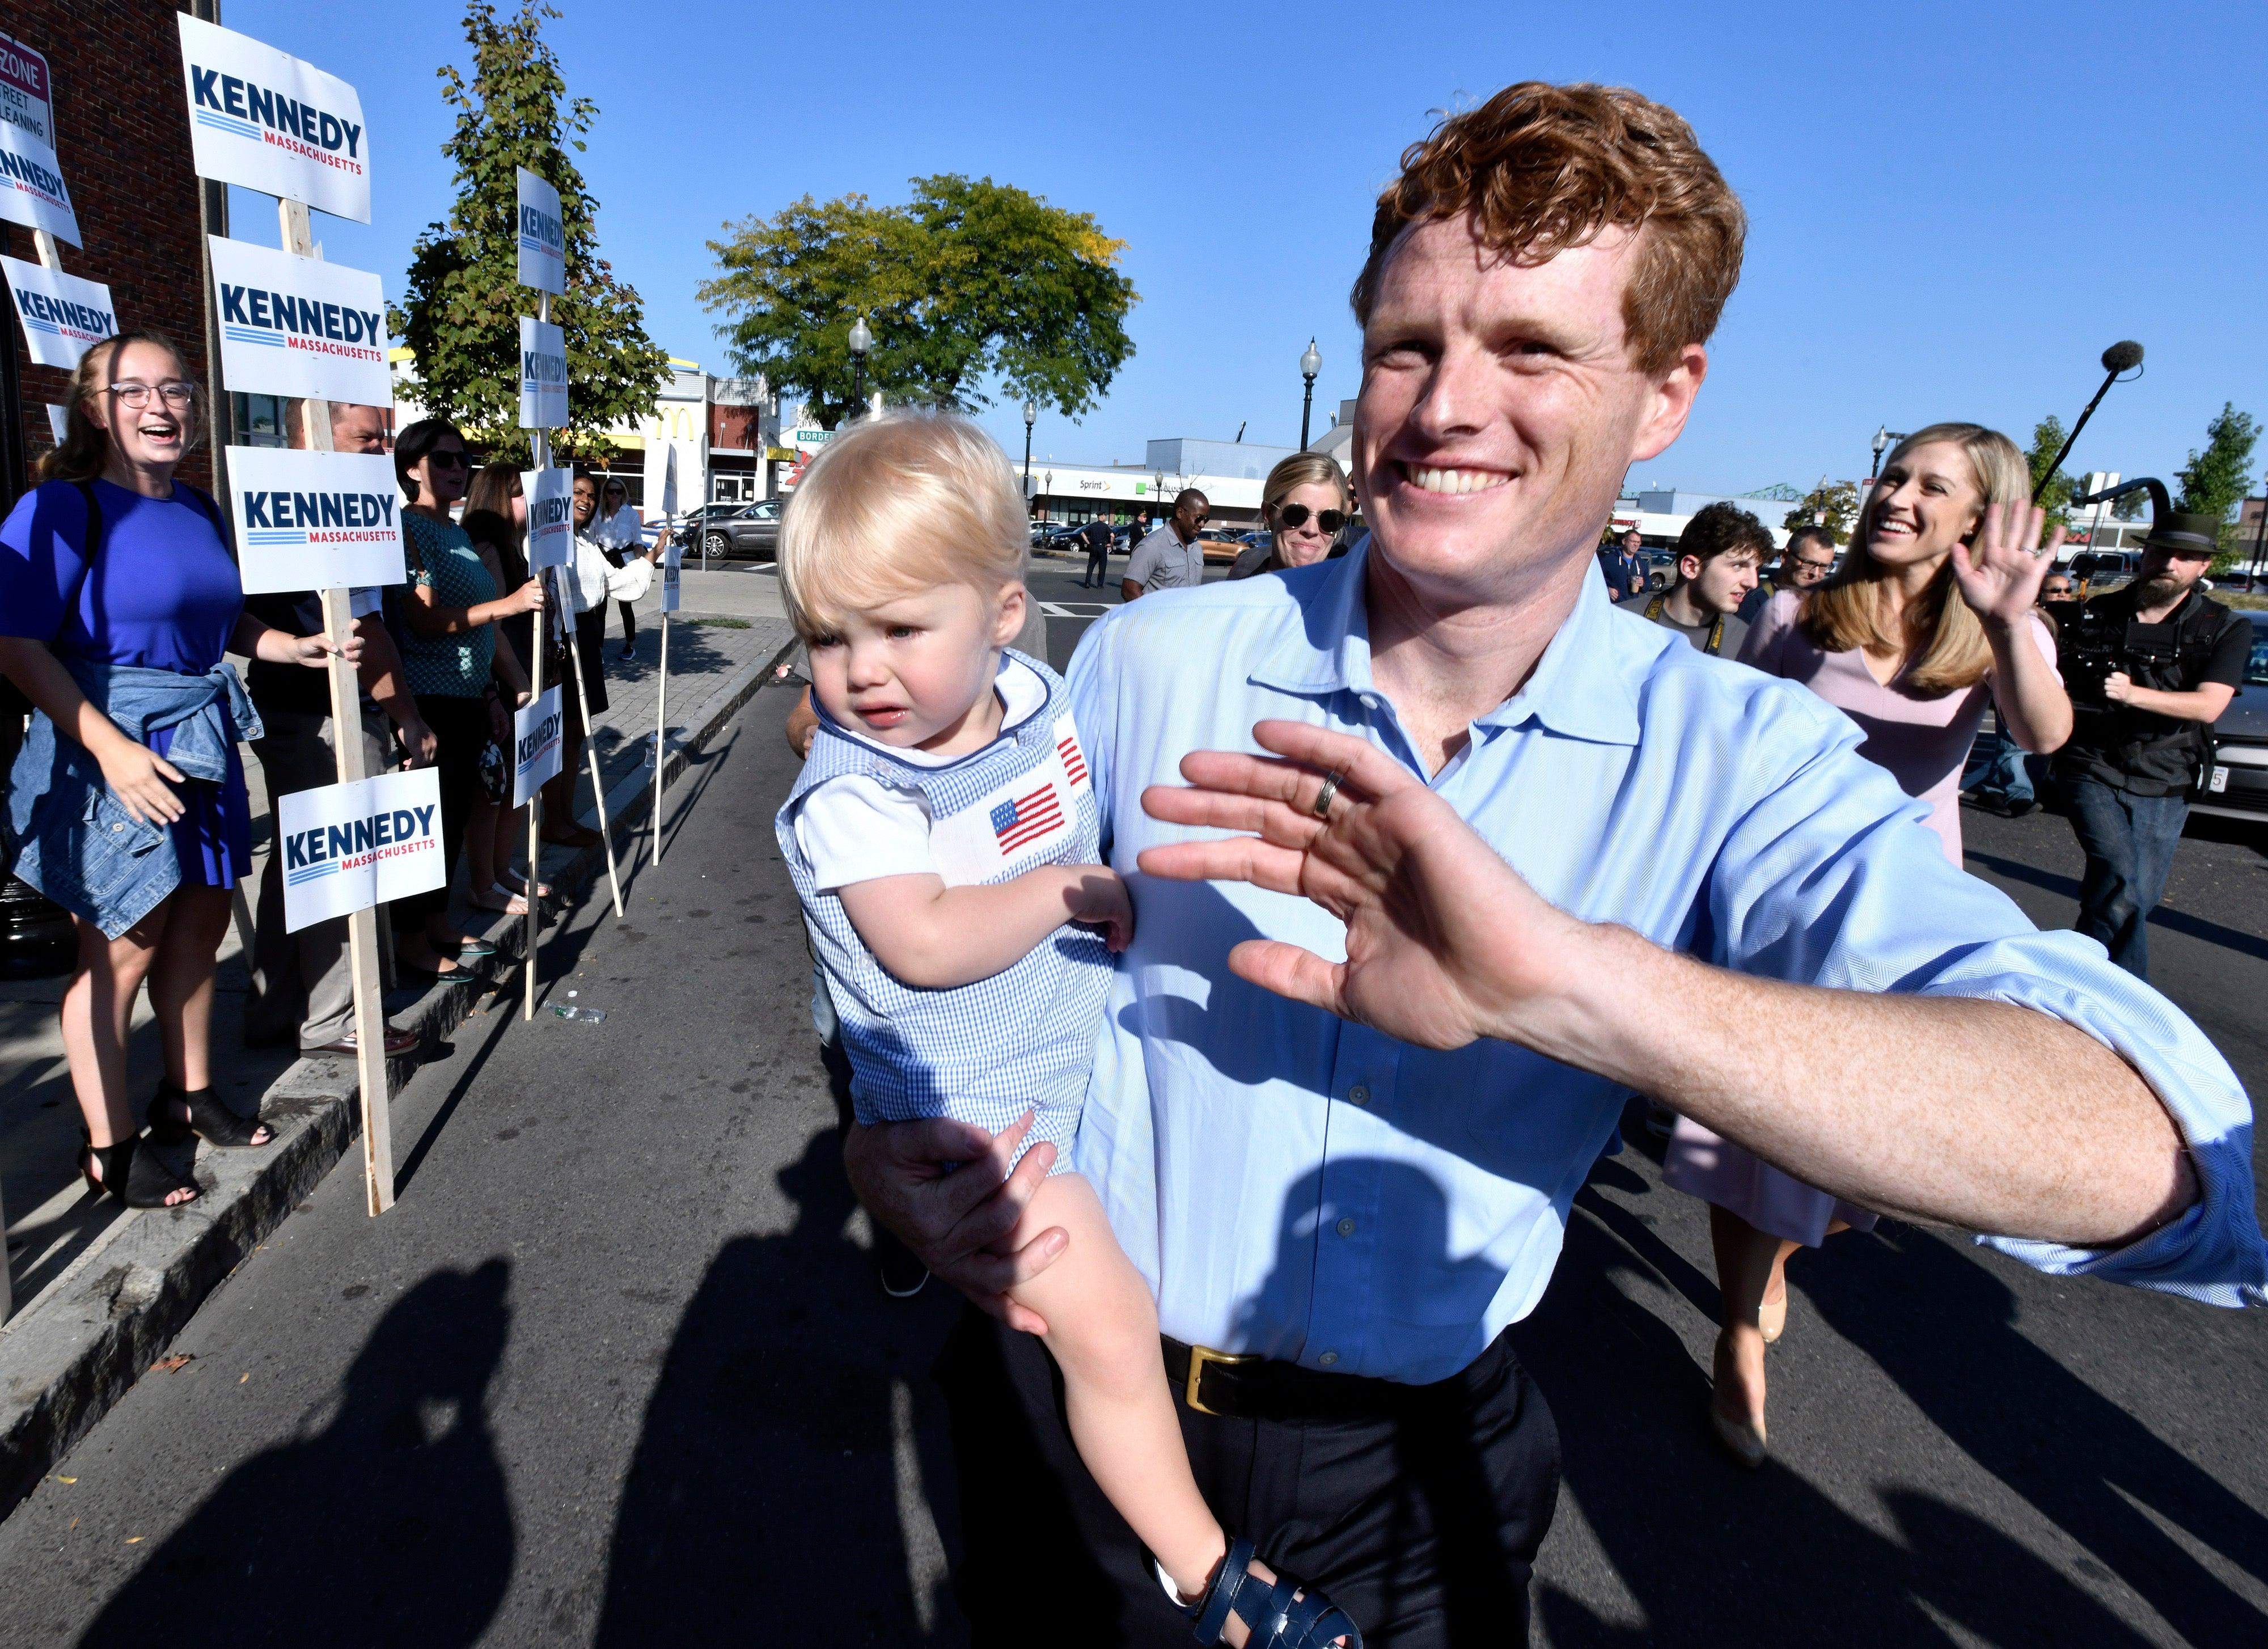 Rep. Joe Kennedy III announces Massachusetts Senate primary challenge against Ed Markey